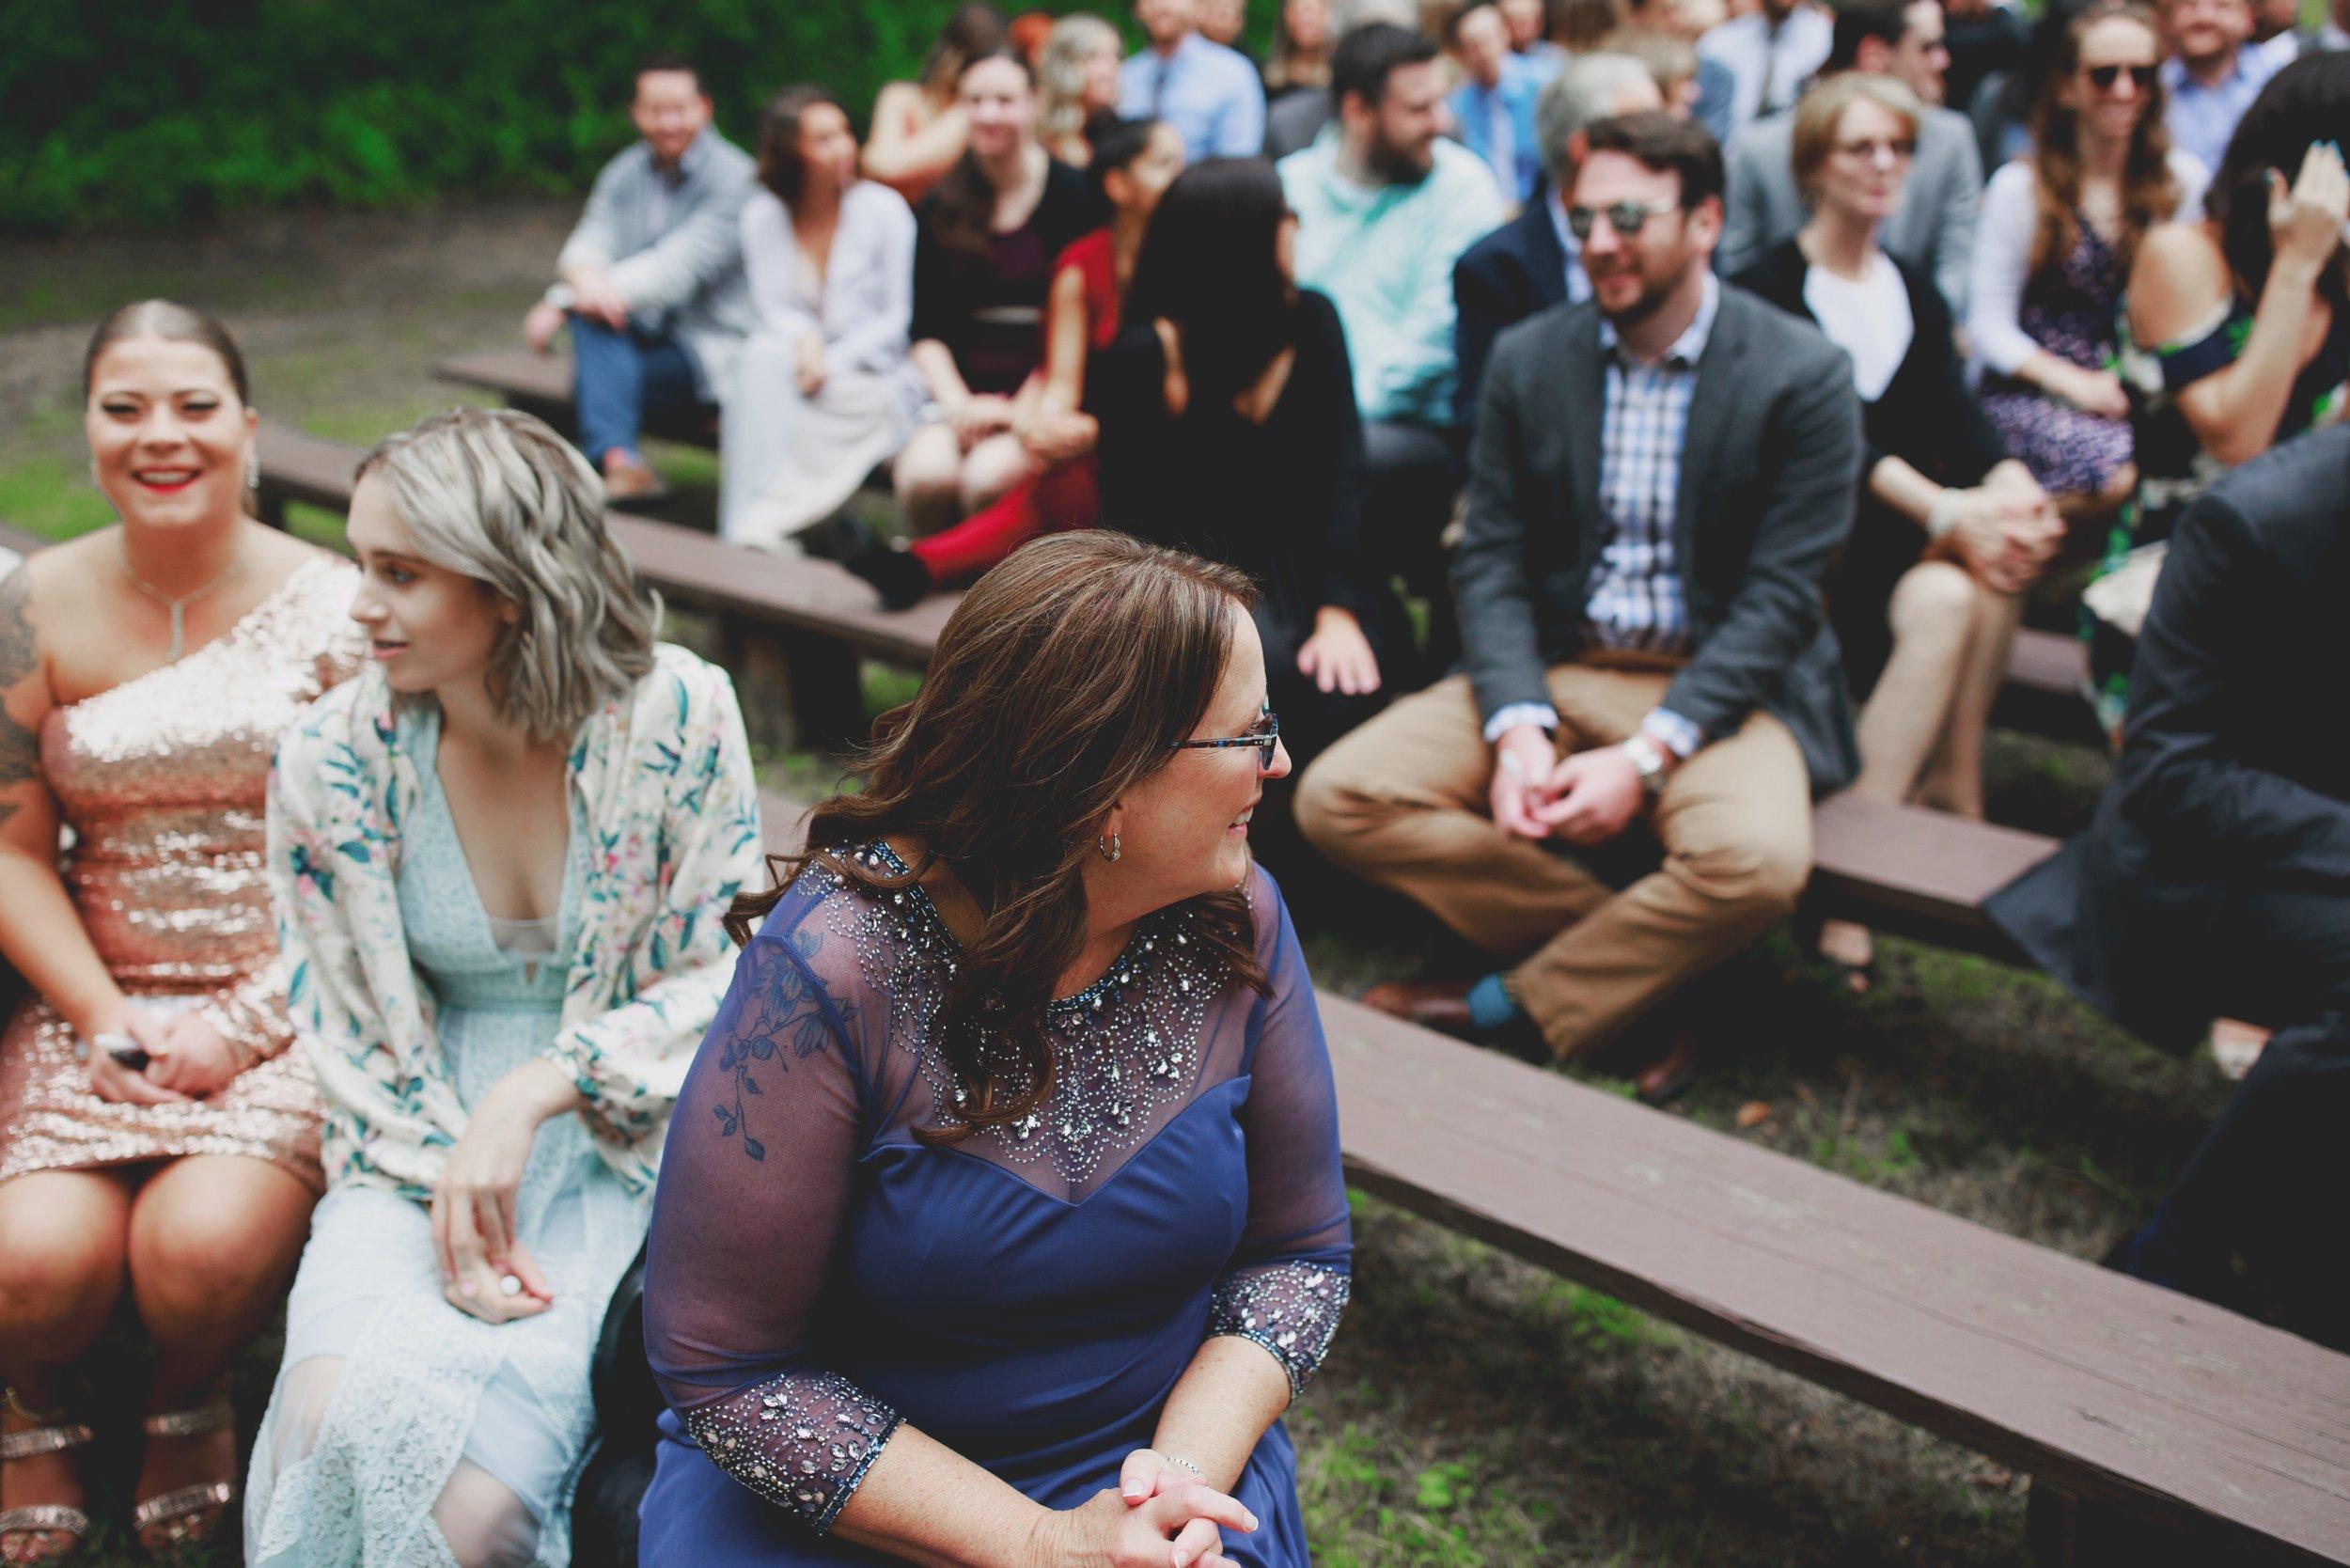 amanda_vanvels_michigan_camp_wedding_082.jpg